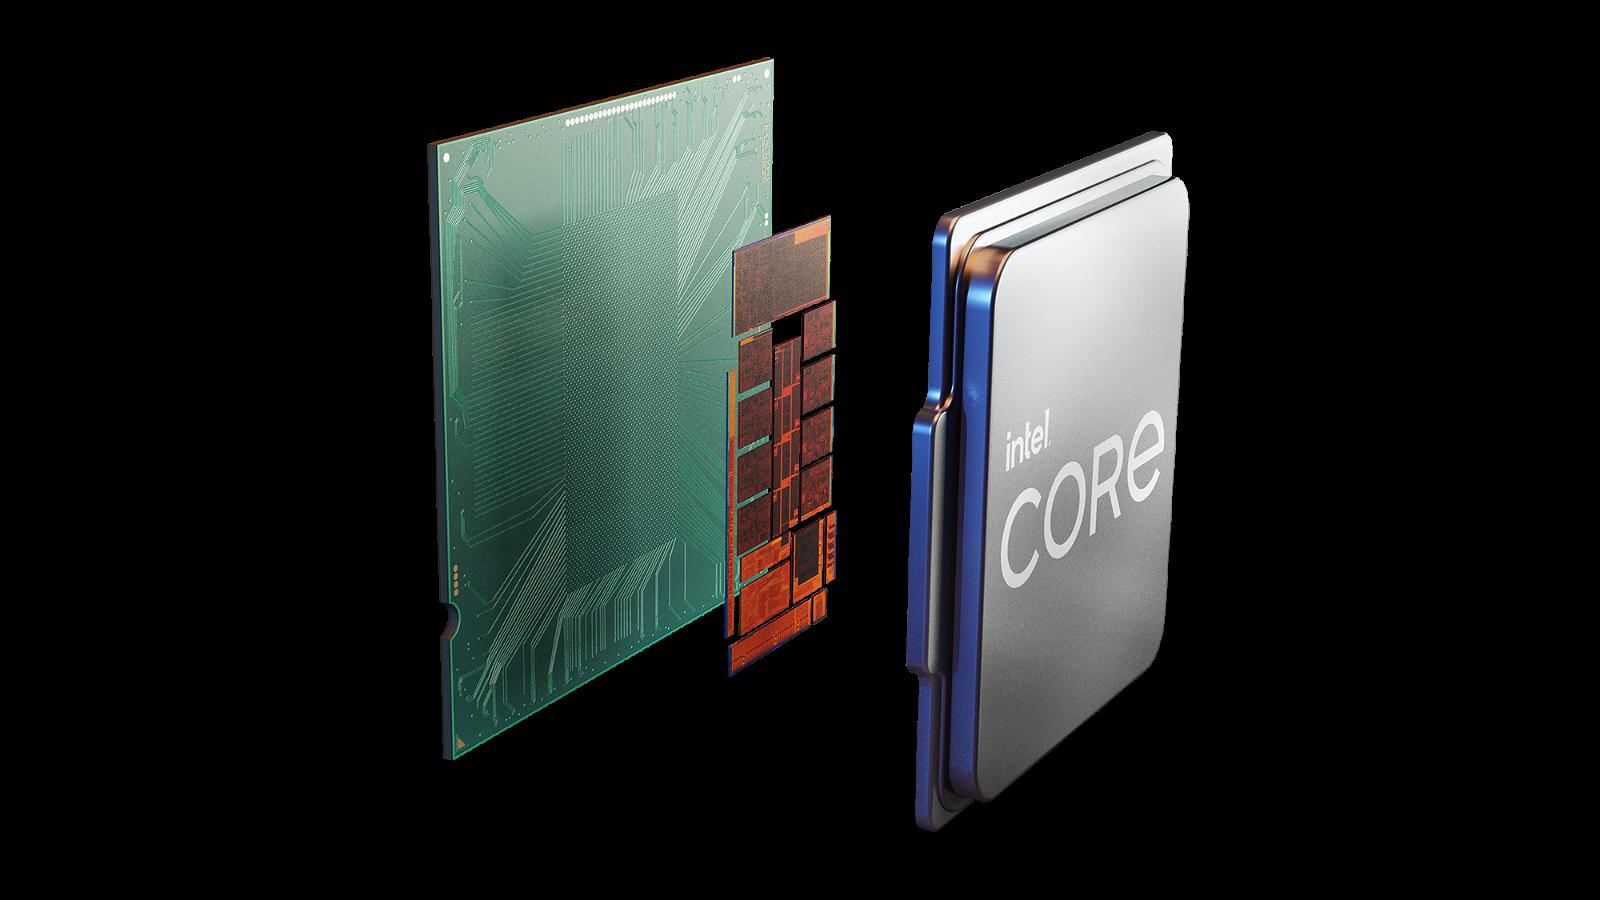 The 11Th Gen Intel® Core™ S-Series Desktop Processors